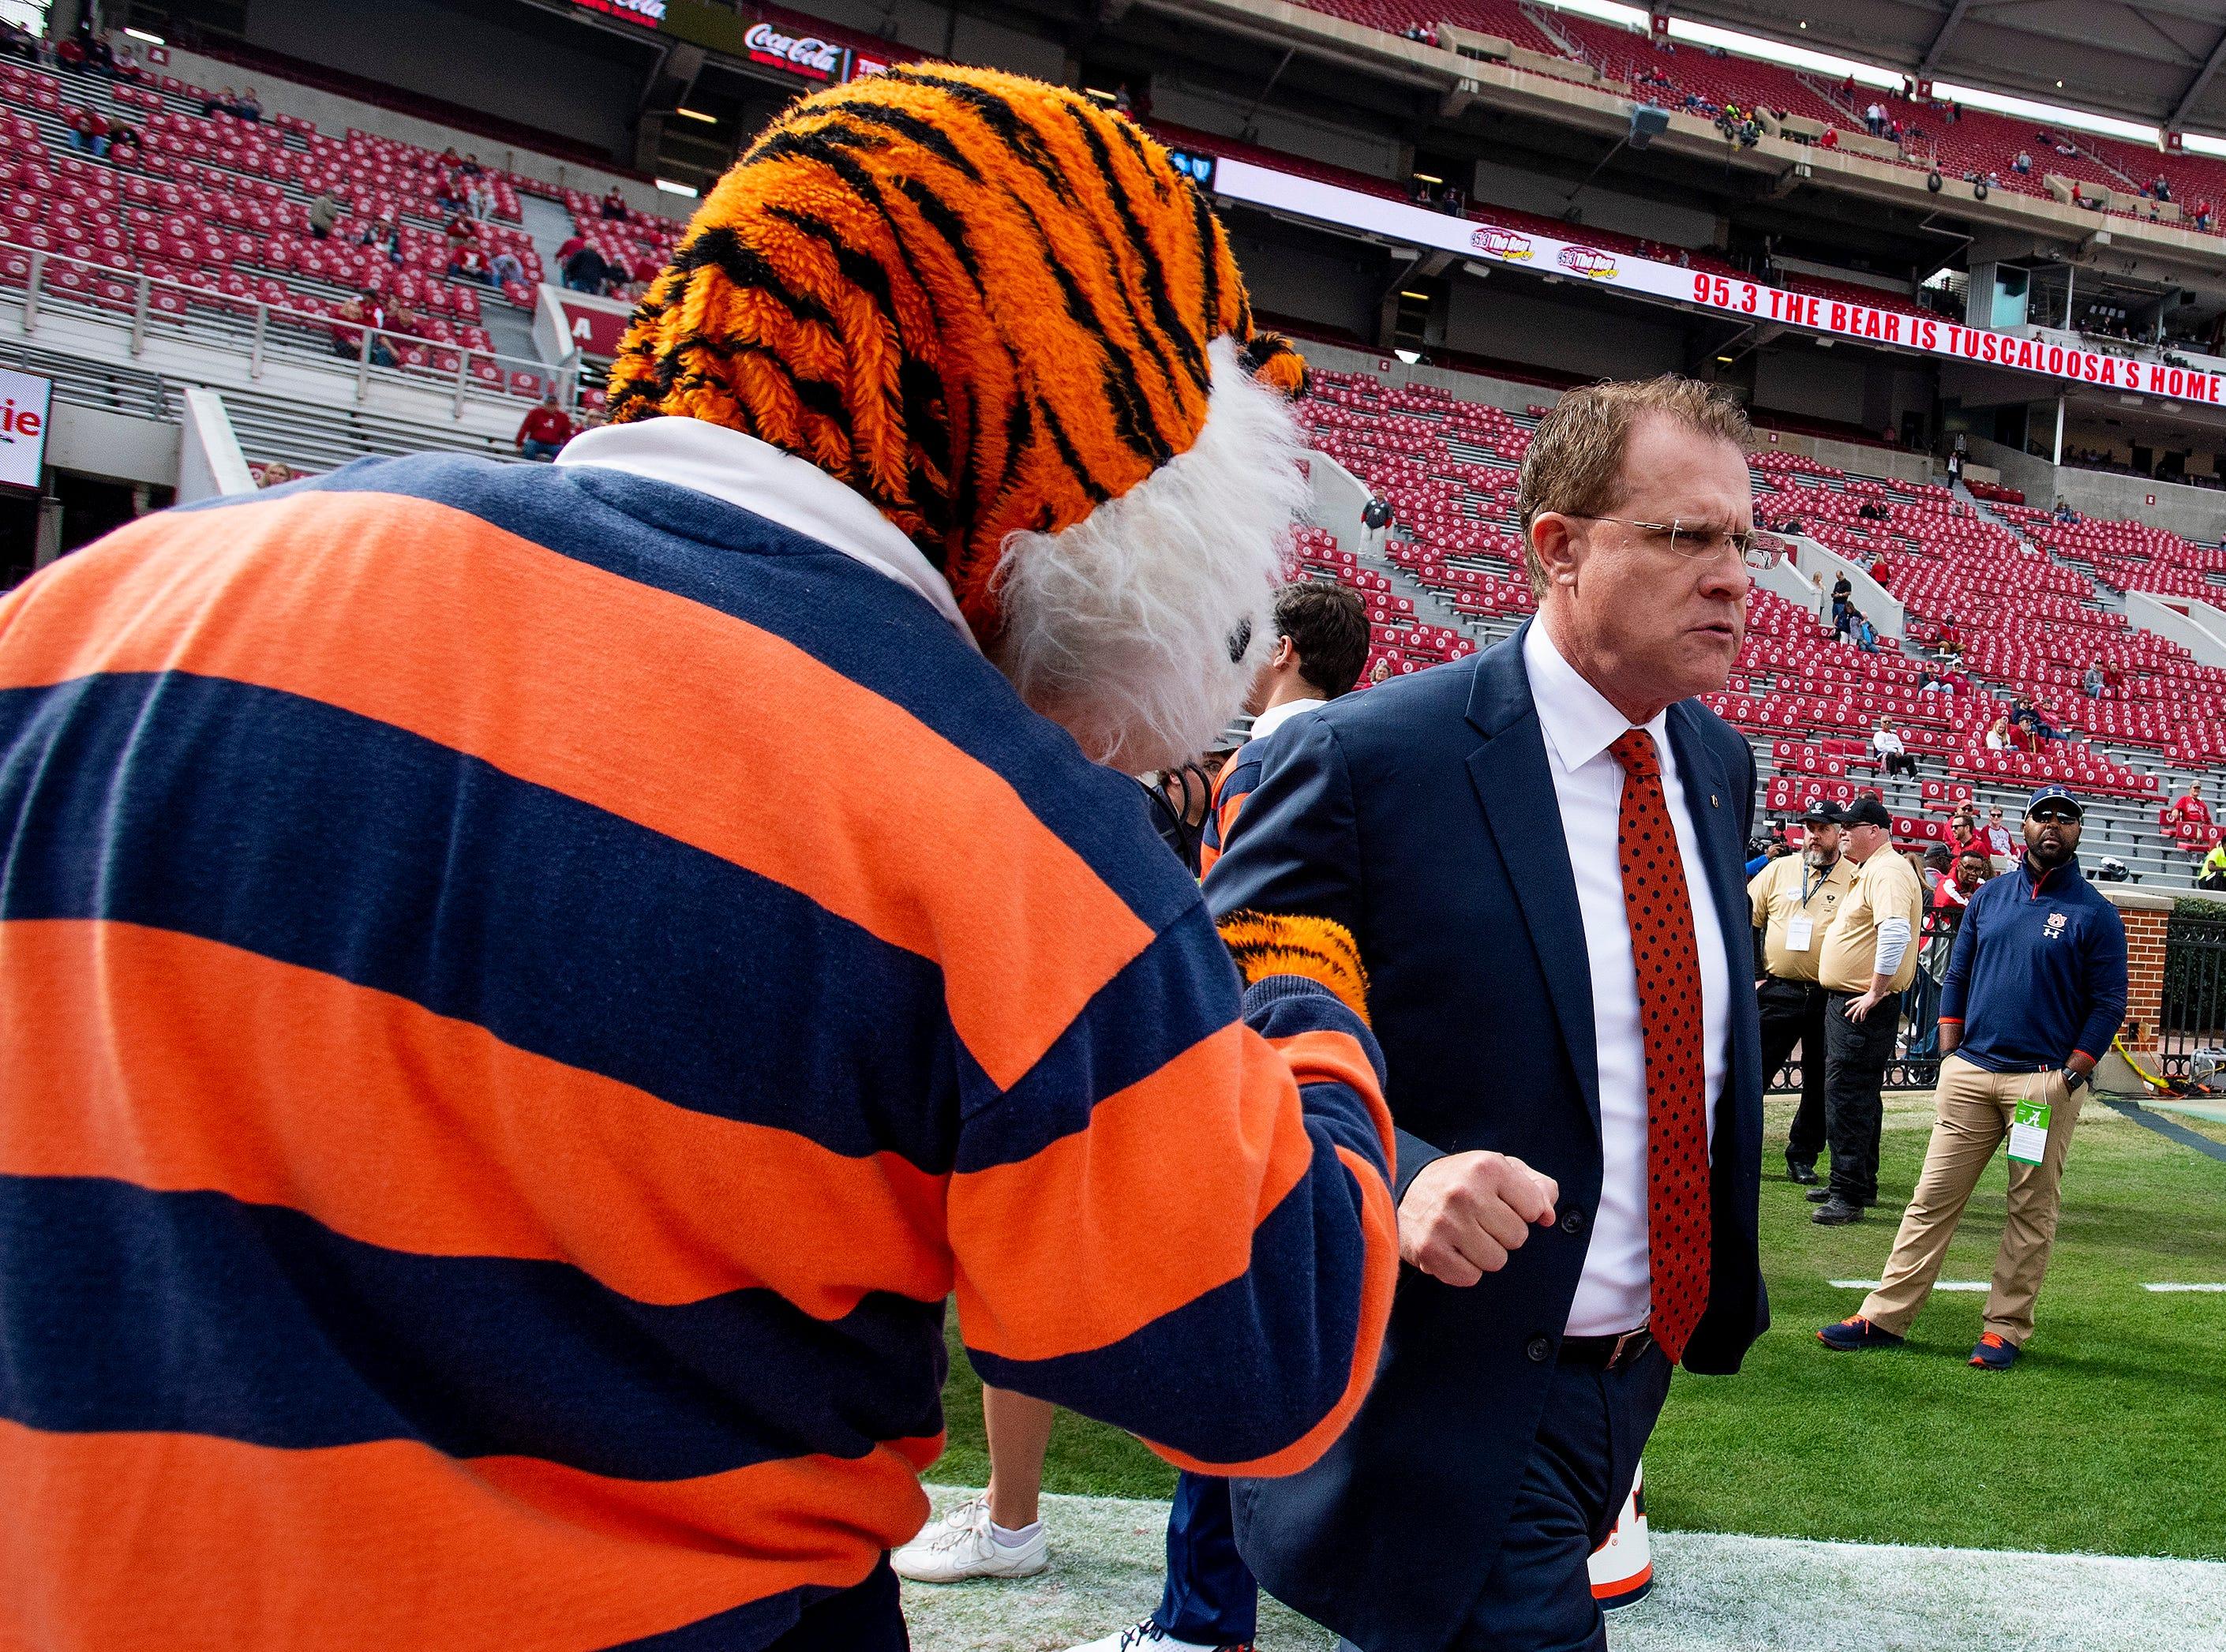 Auburn head coach Gus Malzahn fist bumps Auburn mascot Aubie as Auburn arrives at Bryant-Denny Stadium in Tuscaloosa, Ala., before the Iron Bowl on Saturday November 24, 2018.